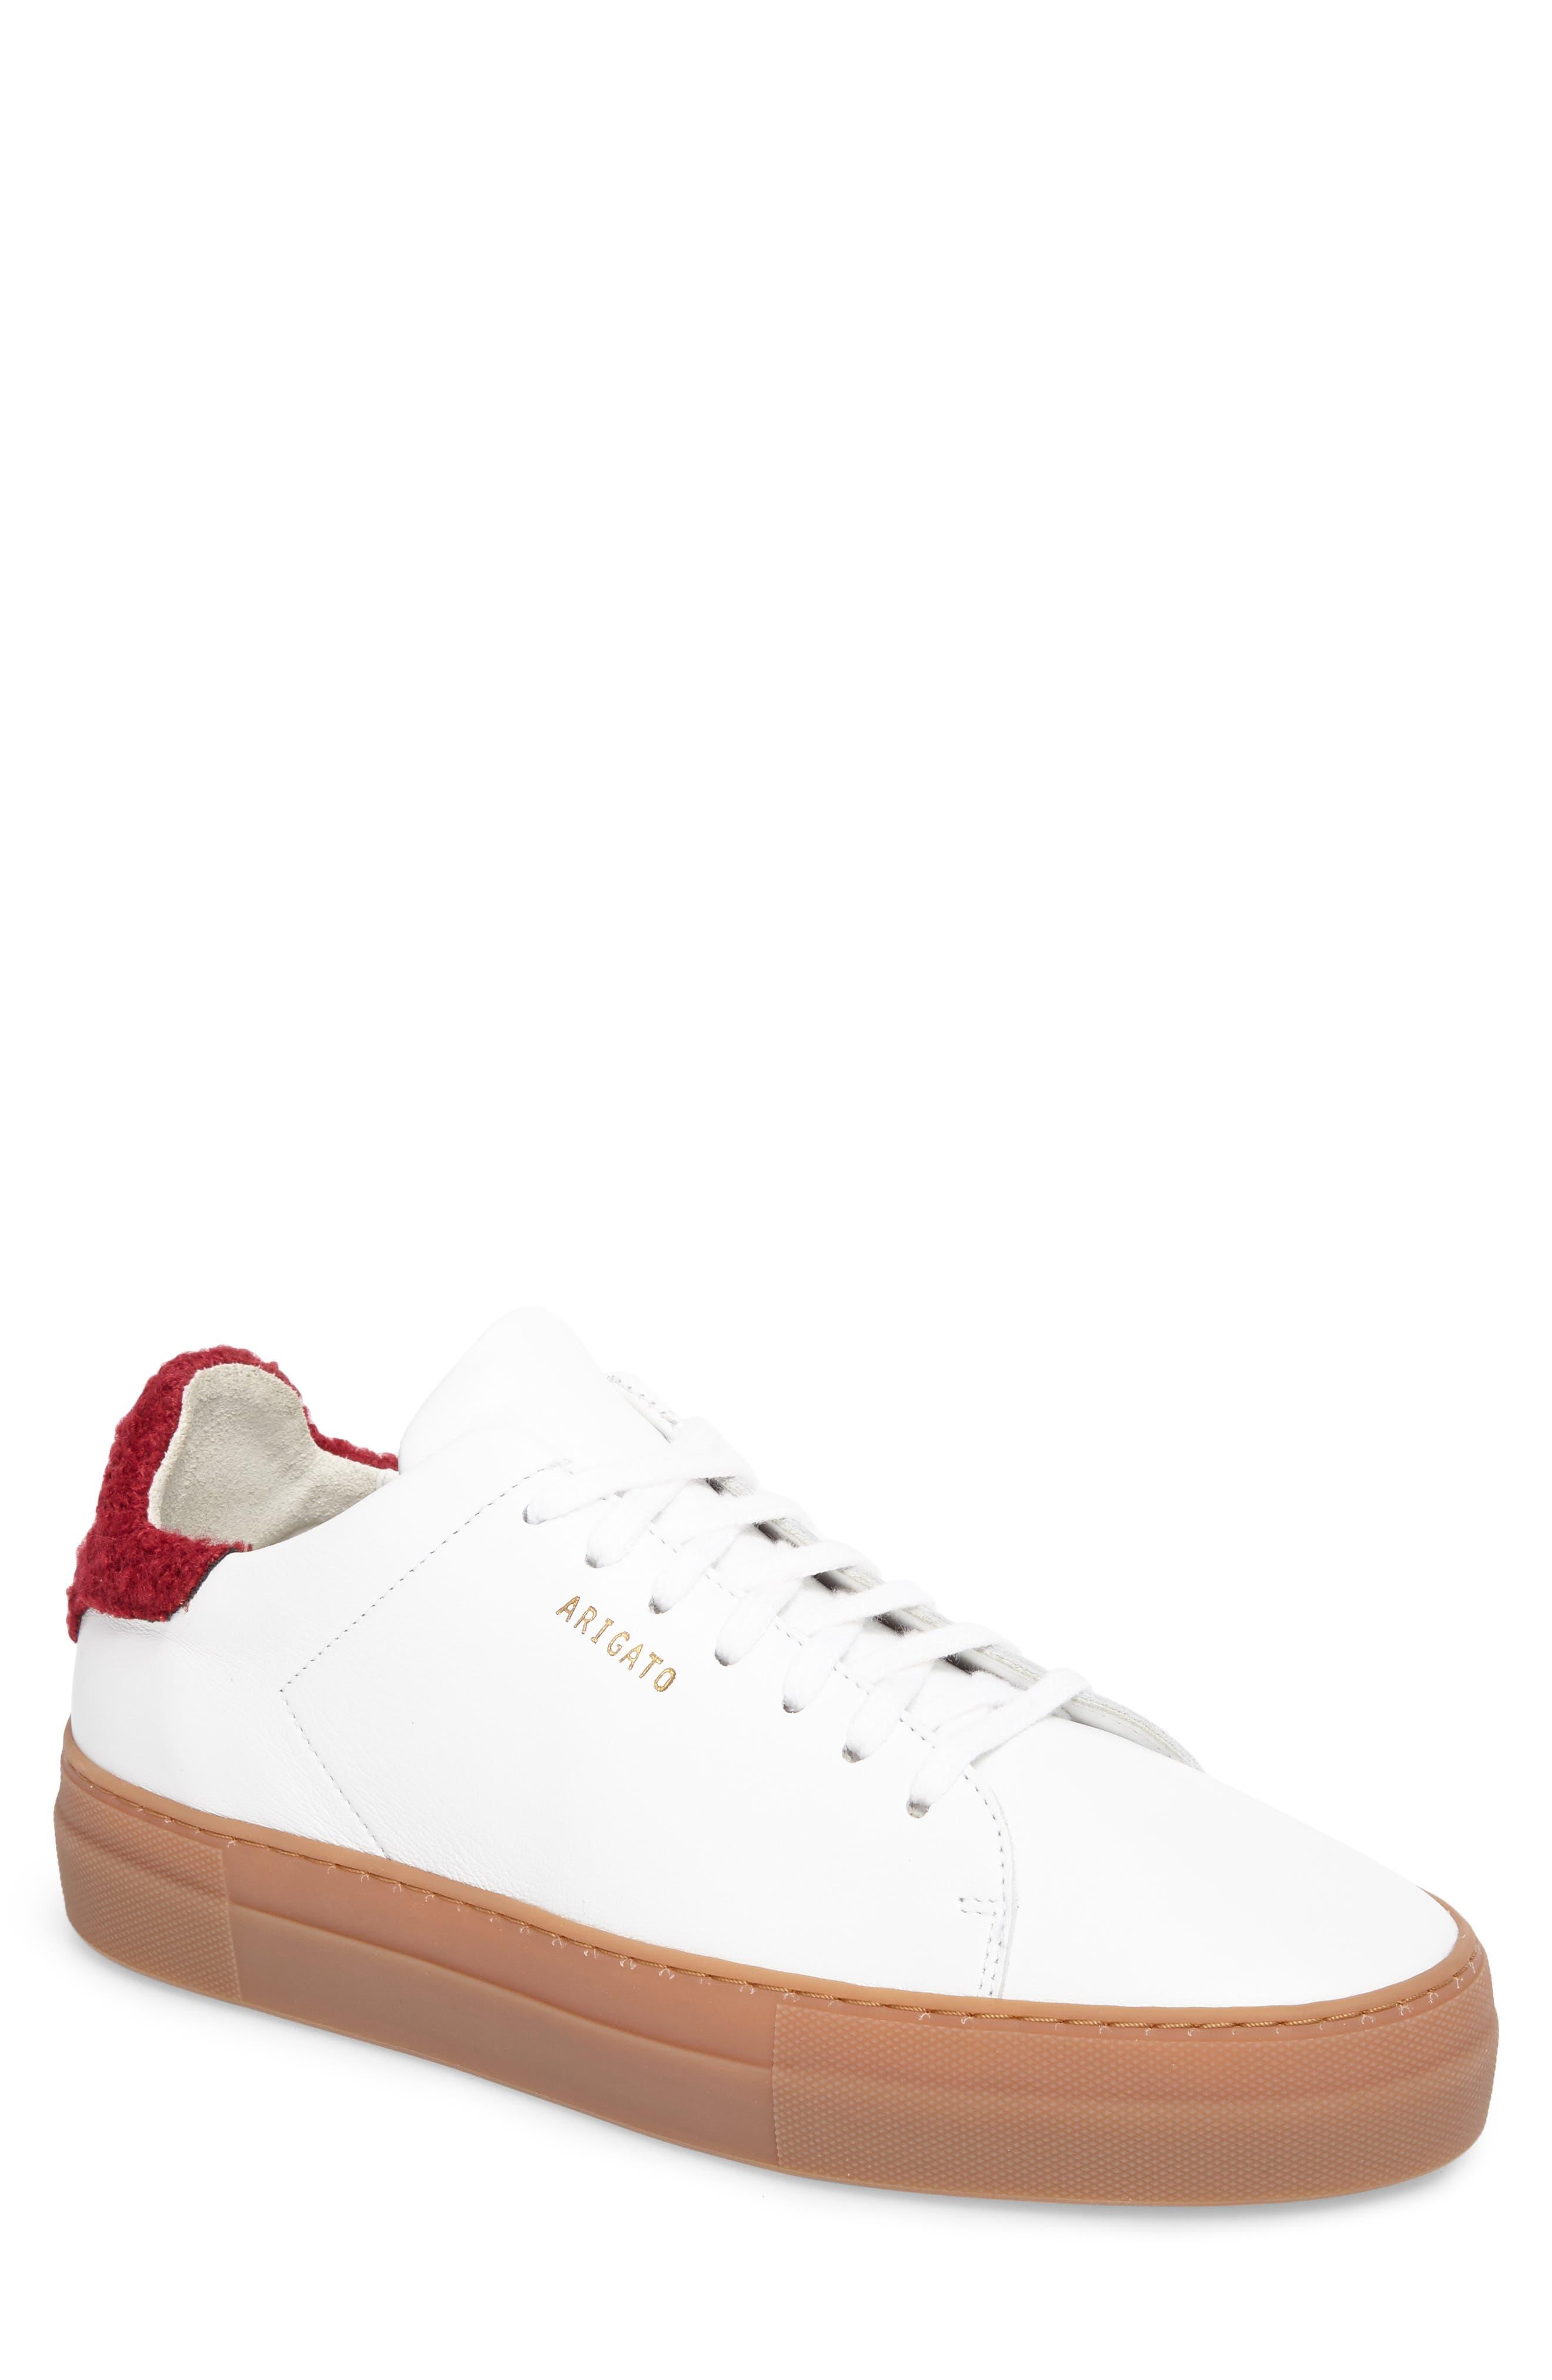 Clean 360 Fuzzy Heel Sneaker,                             Main thumbnail 1, color,                             White